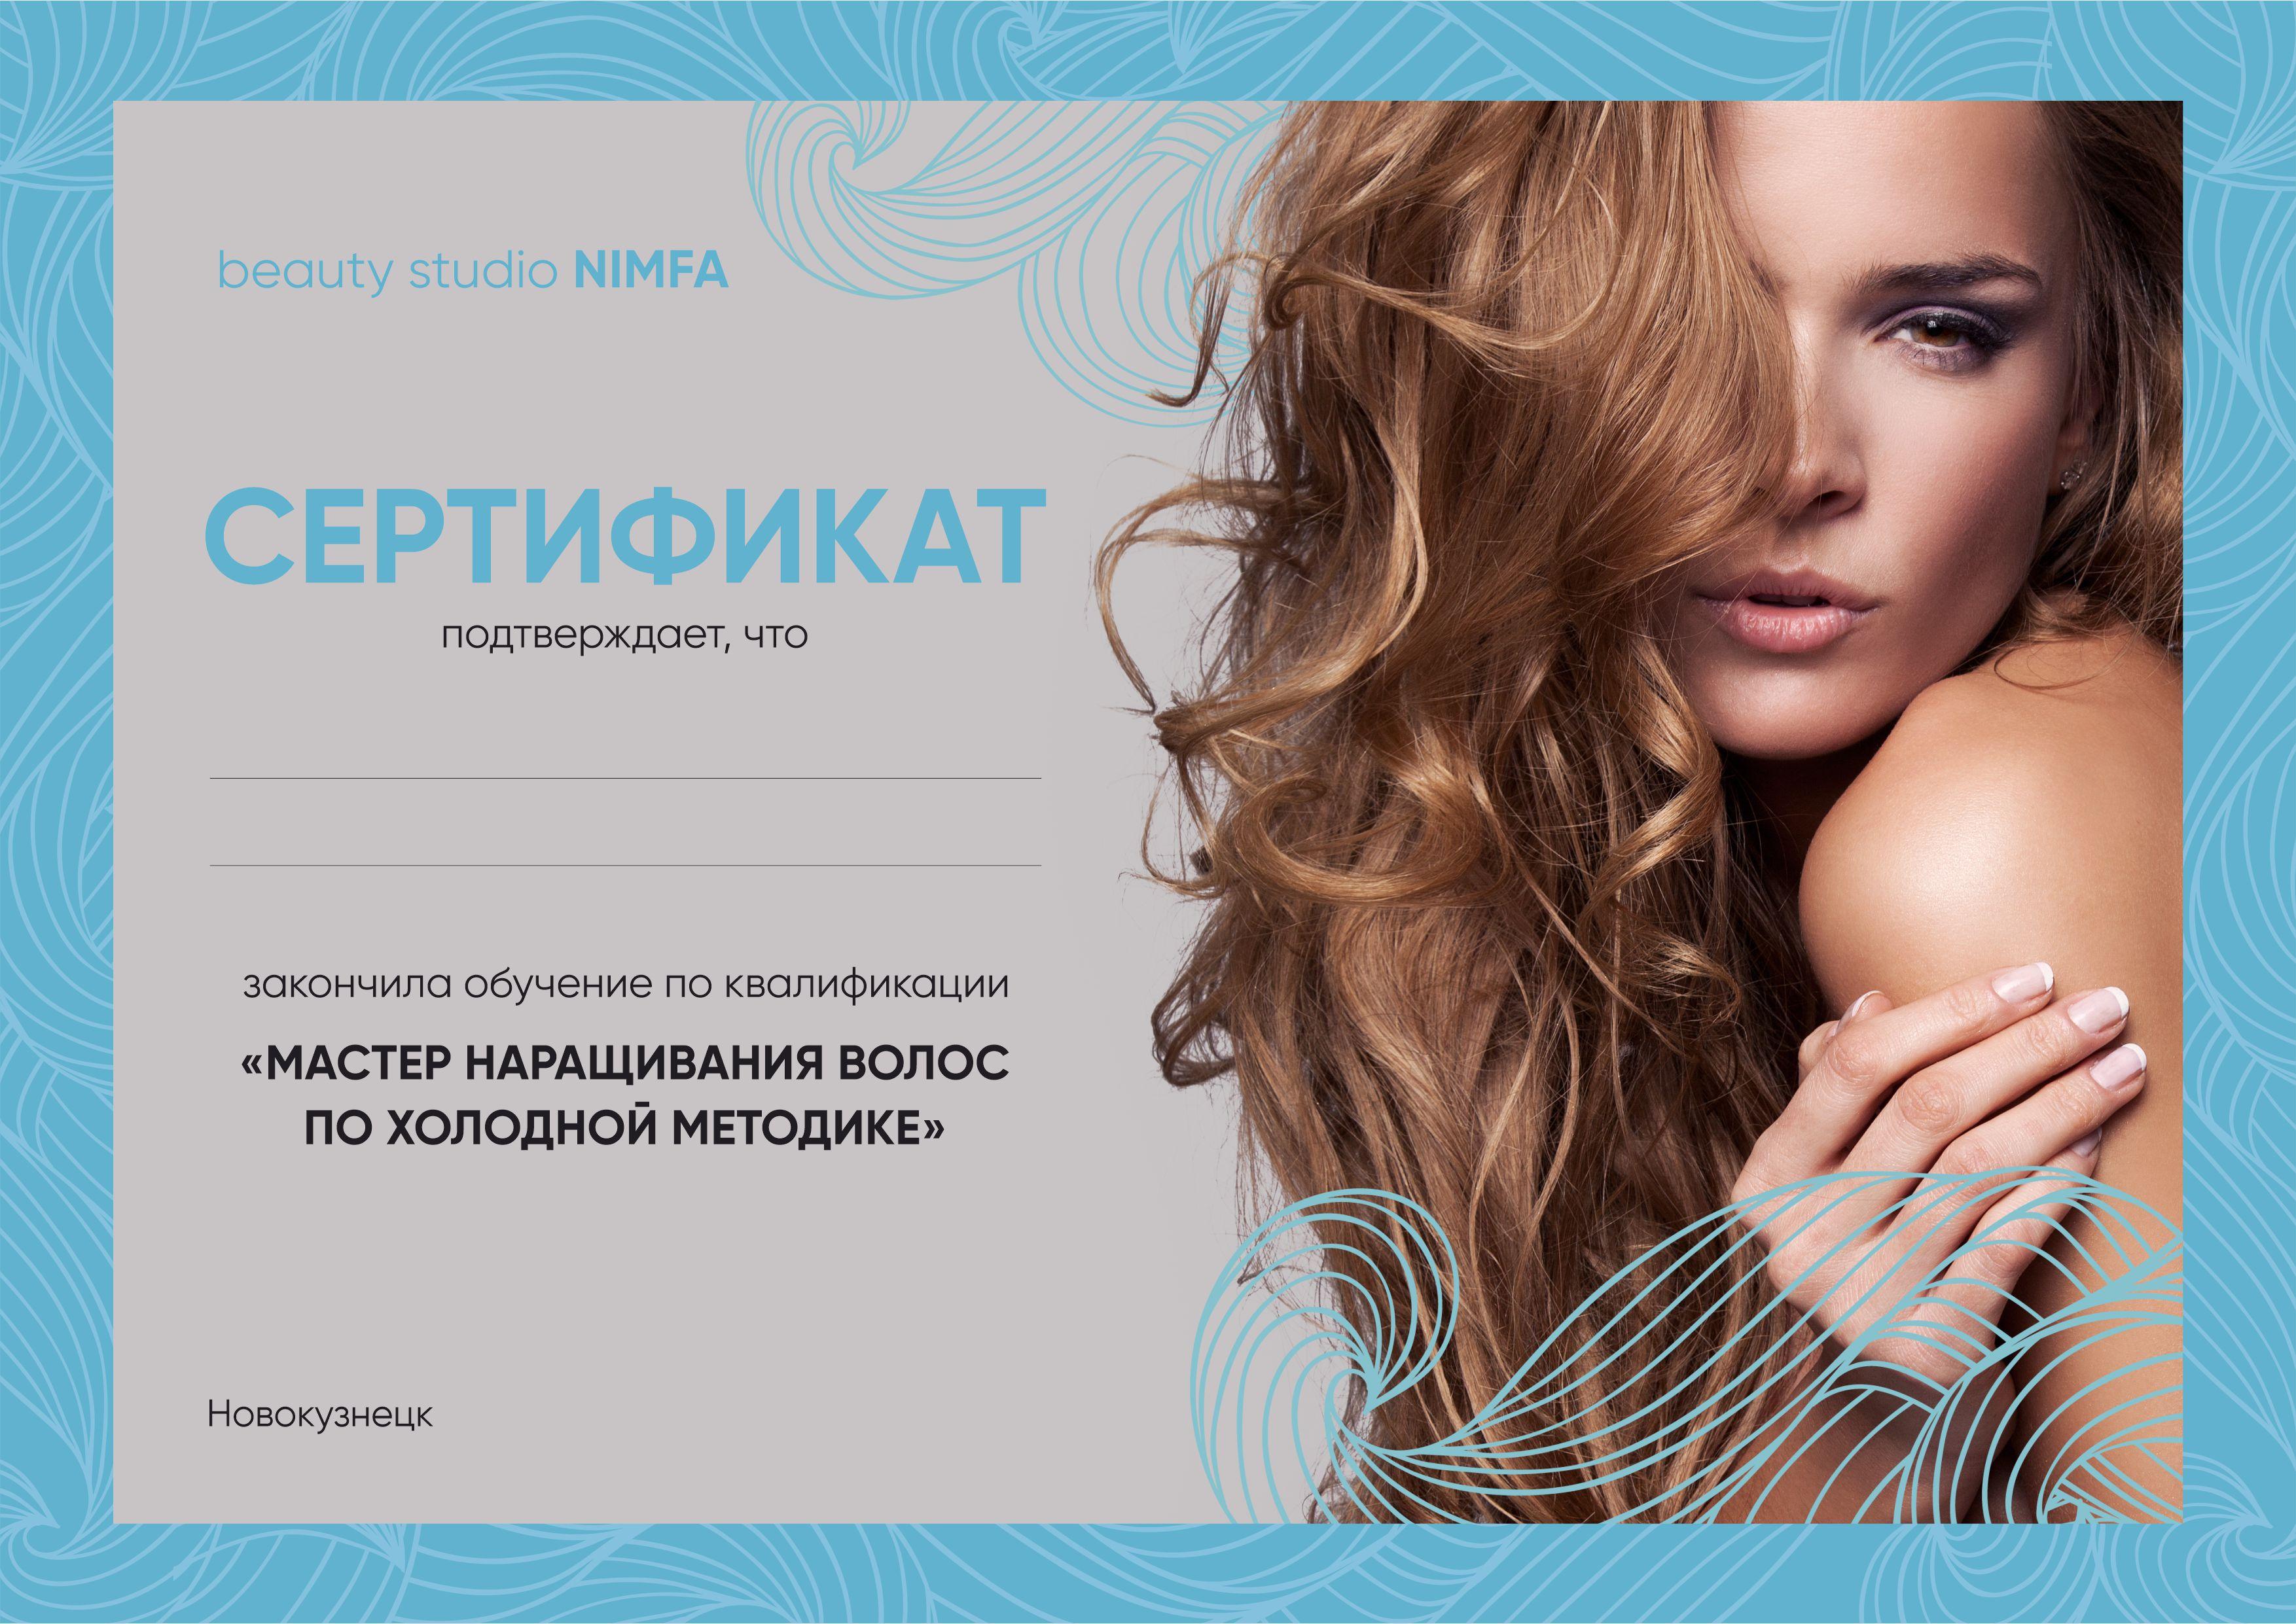 Сертификат Nimfa